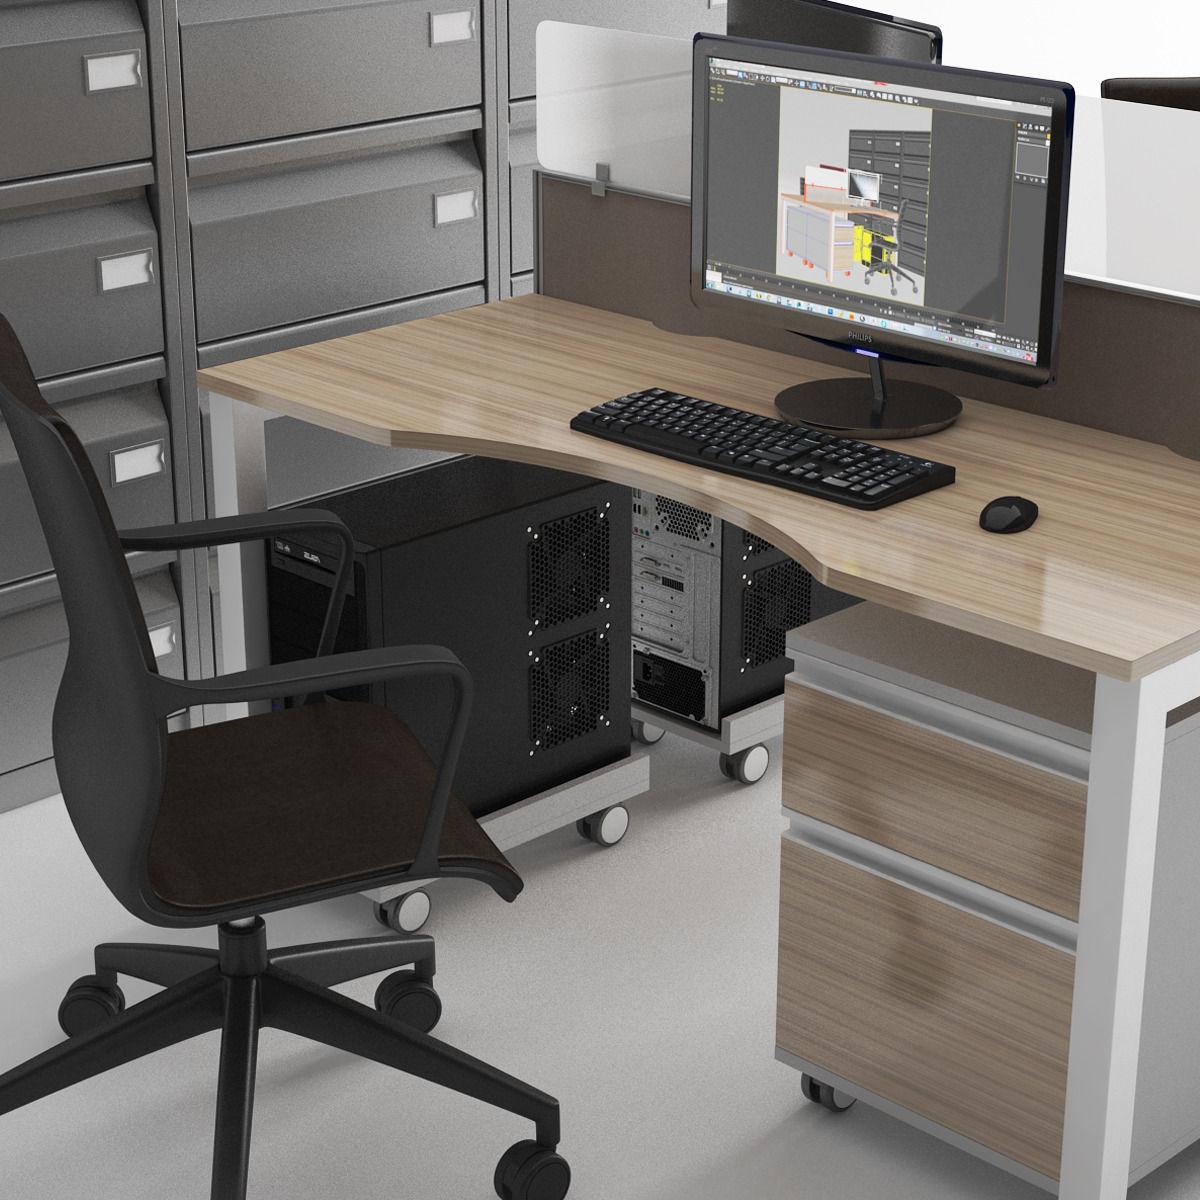 Lastest Office Furniture Set 3d Model Highly Detailed Model Of Office